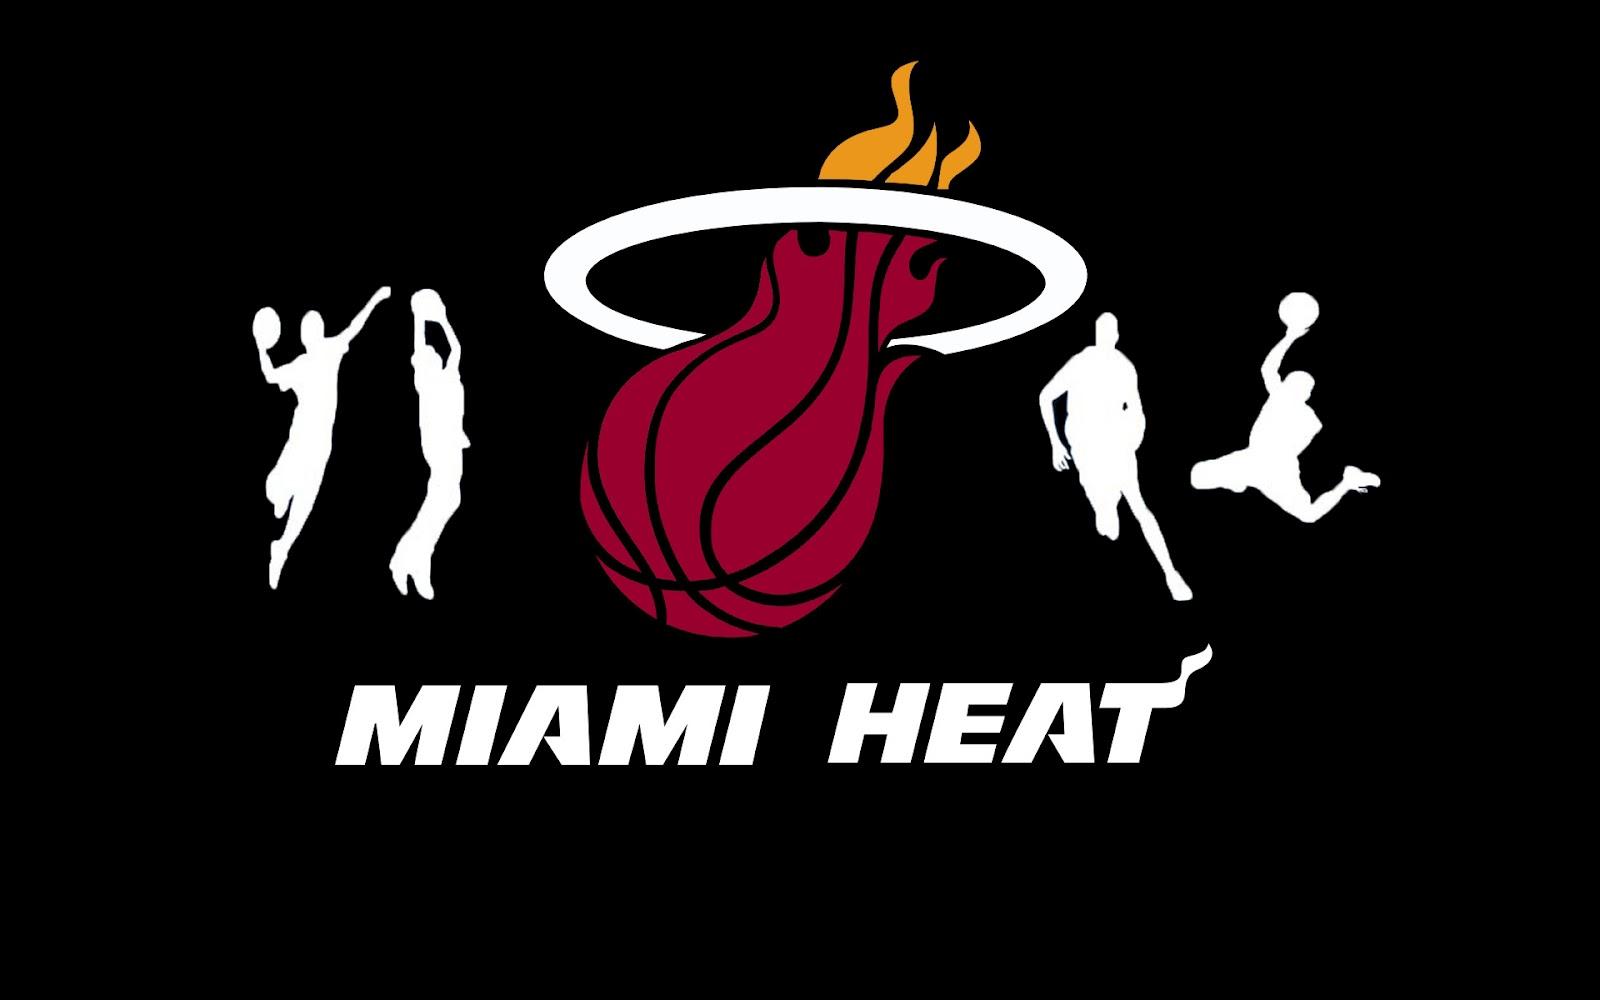 Miami Heat Wallpaper Pictures 1600x1000